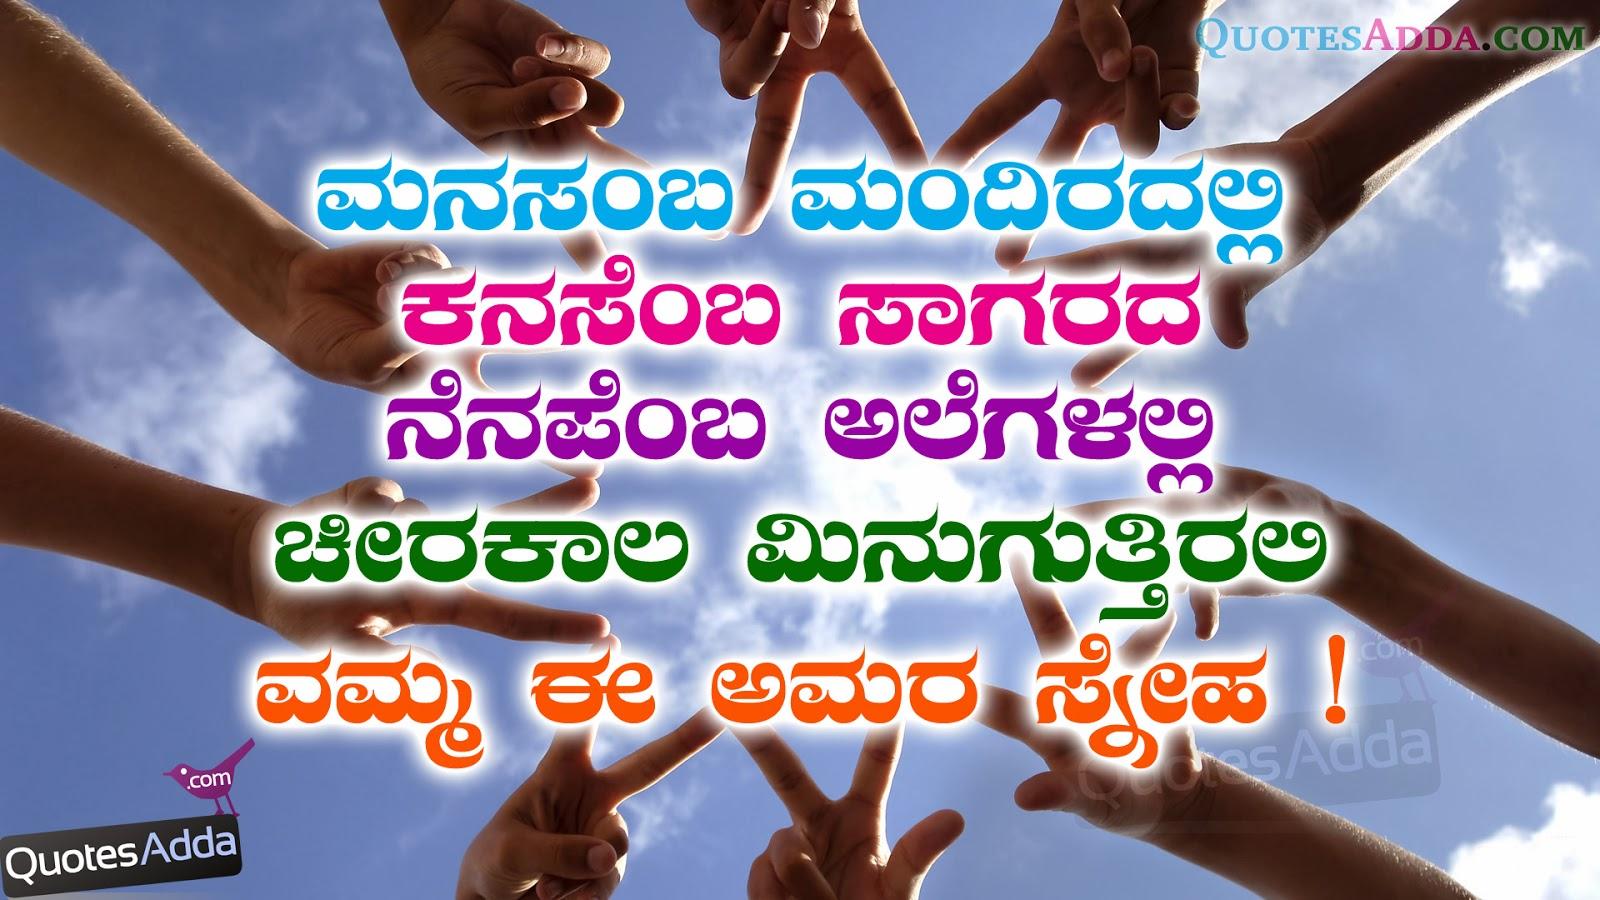 beautiful kannada friendship quotes with images quotesadda   telugu quotes tamil quotes